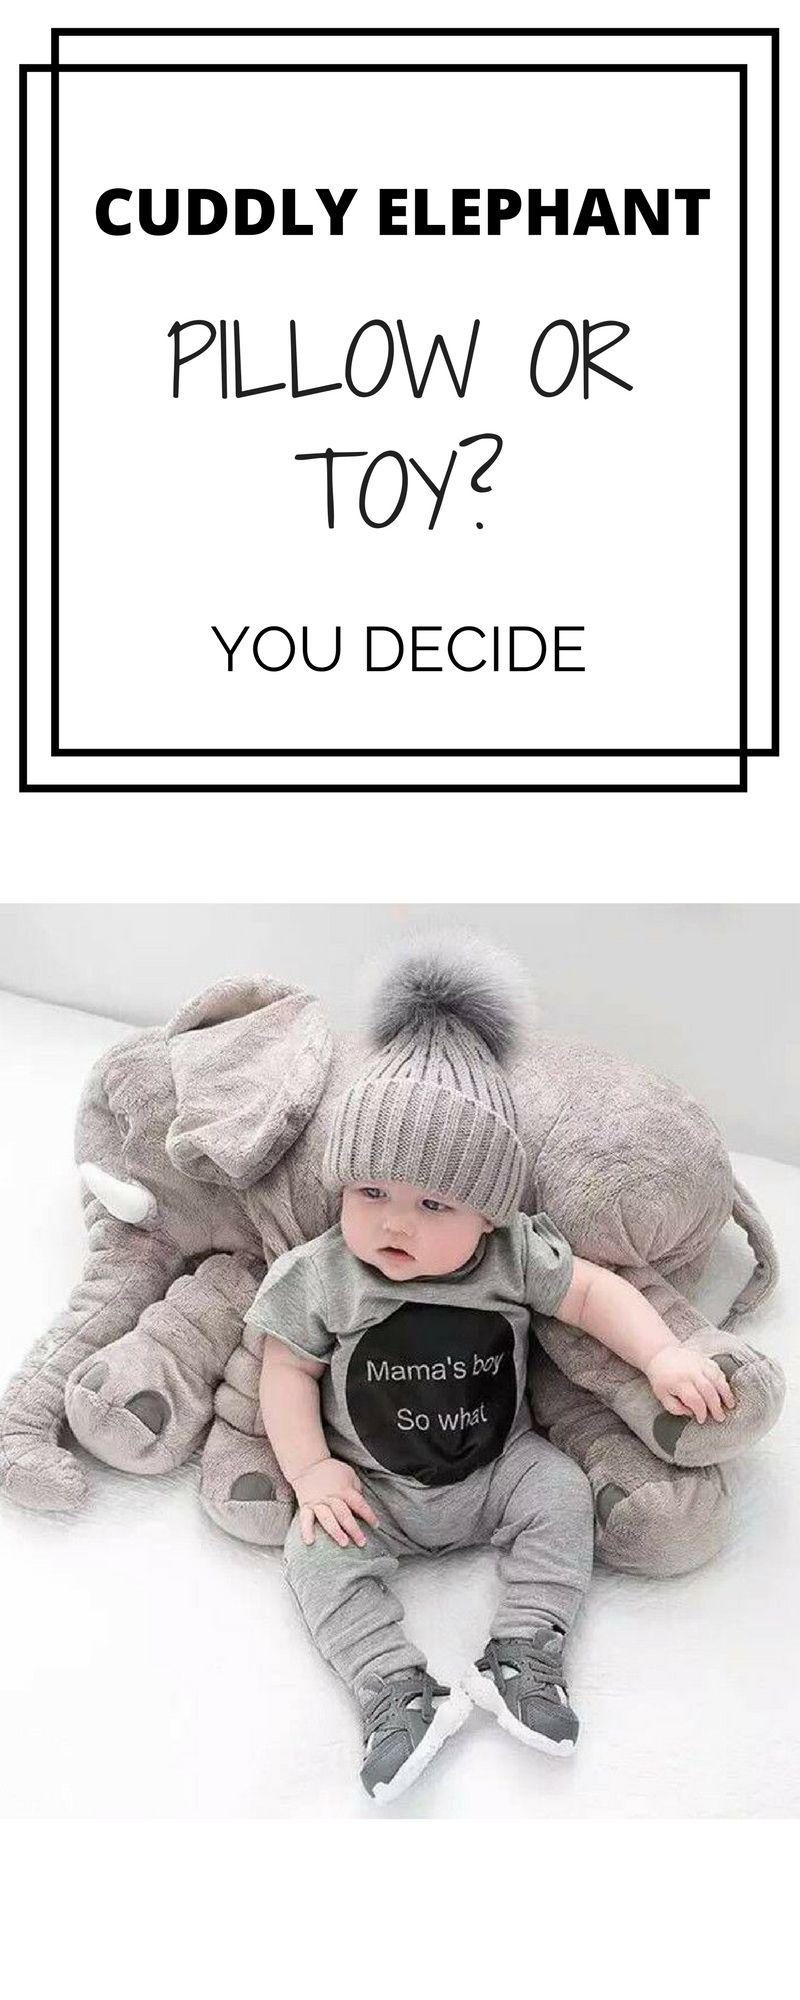 f17584c16 ♥♥♥ Christmas cuddly TOY ELEPHANT PILLOW ♥ Plush Baby Elephant ...